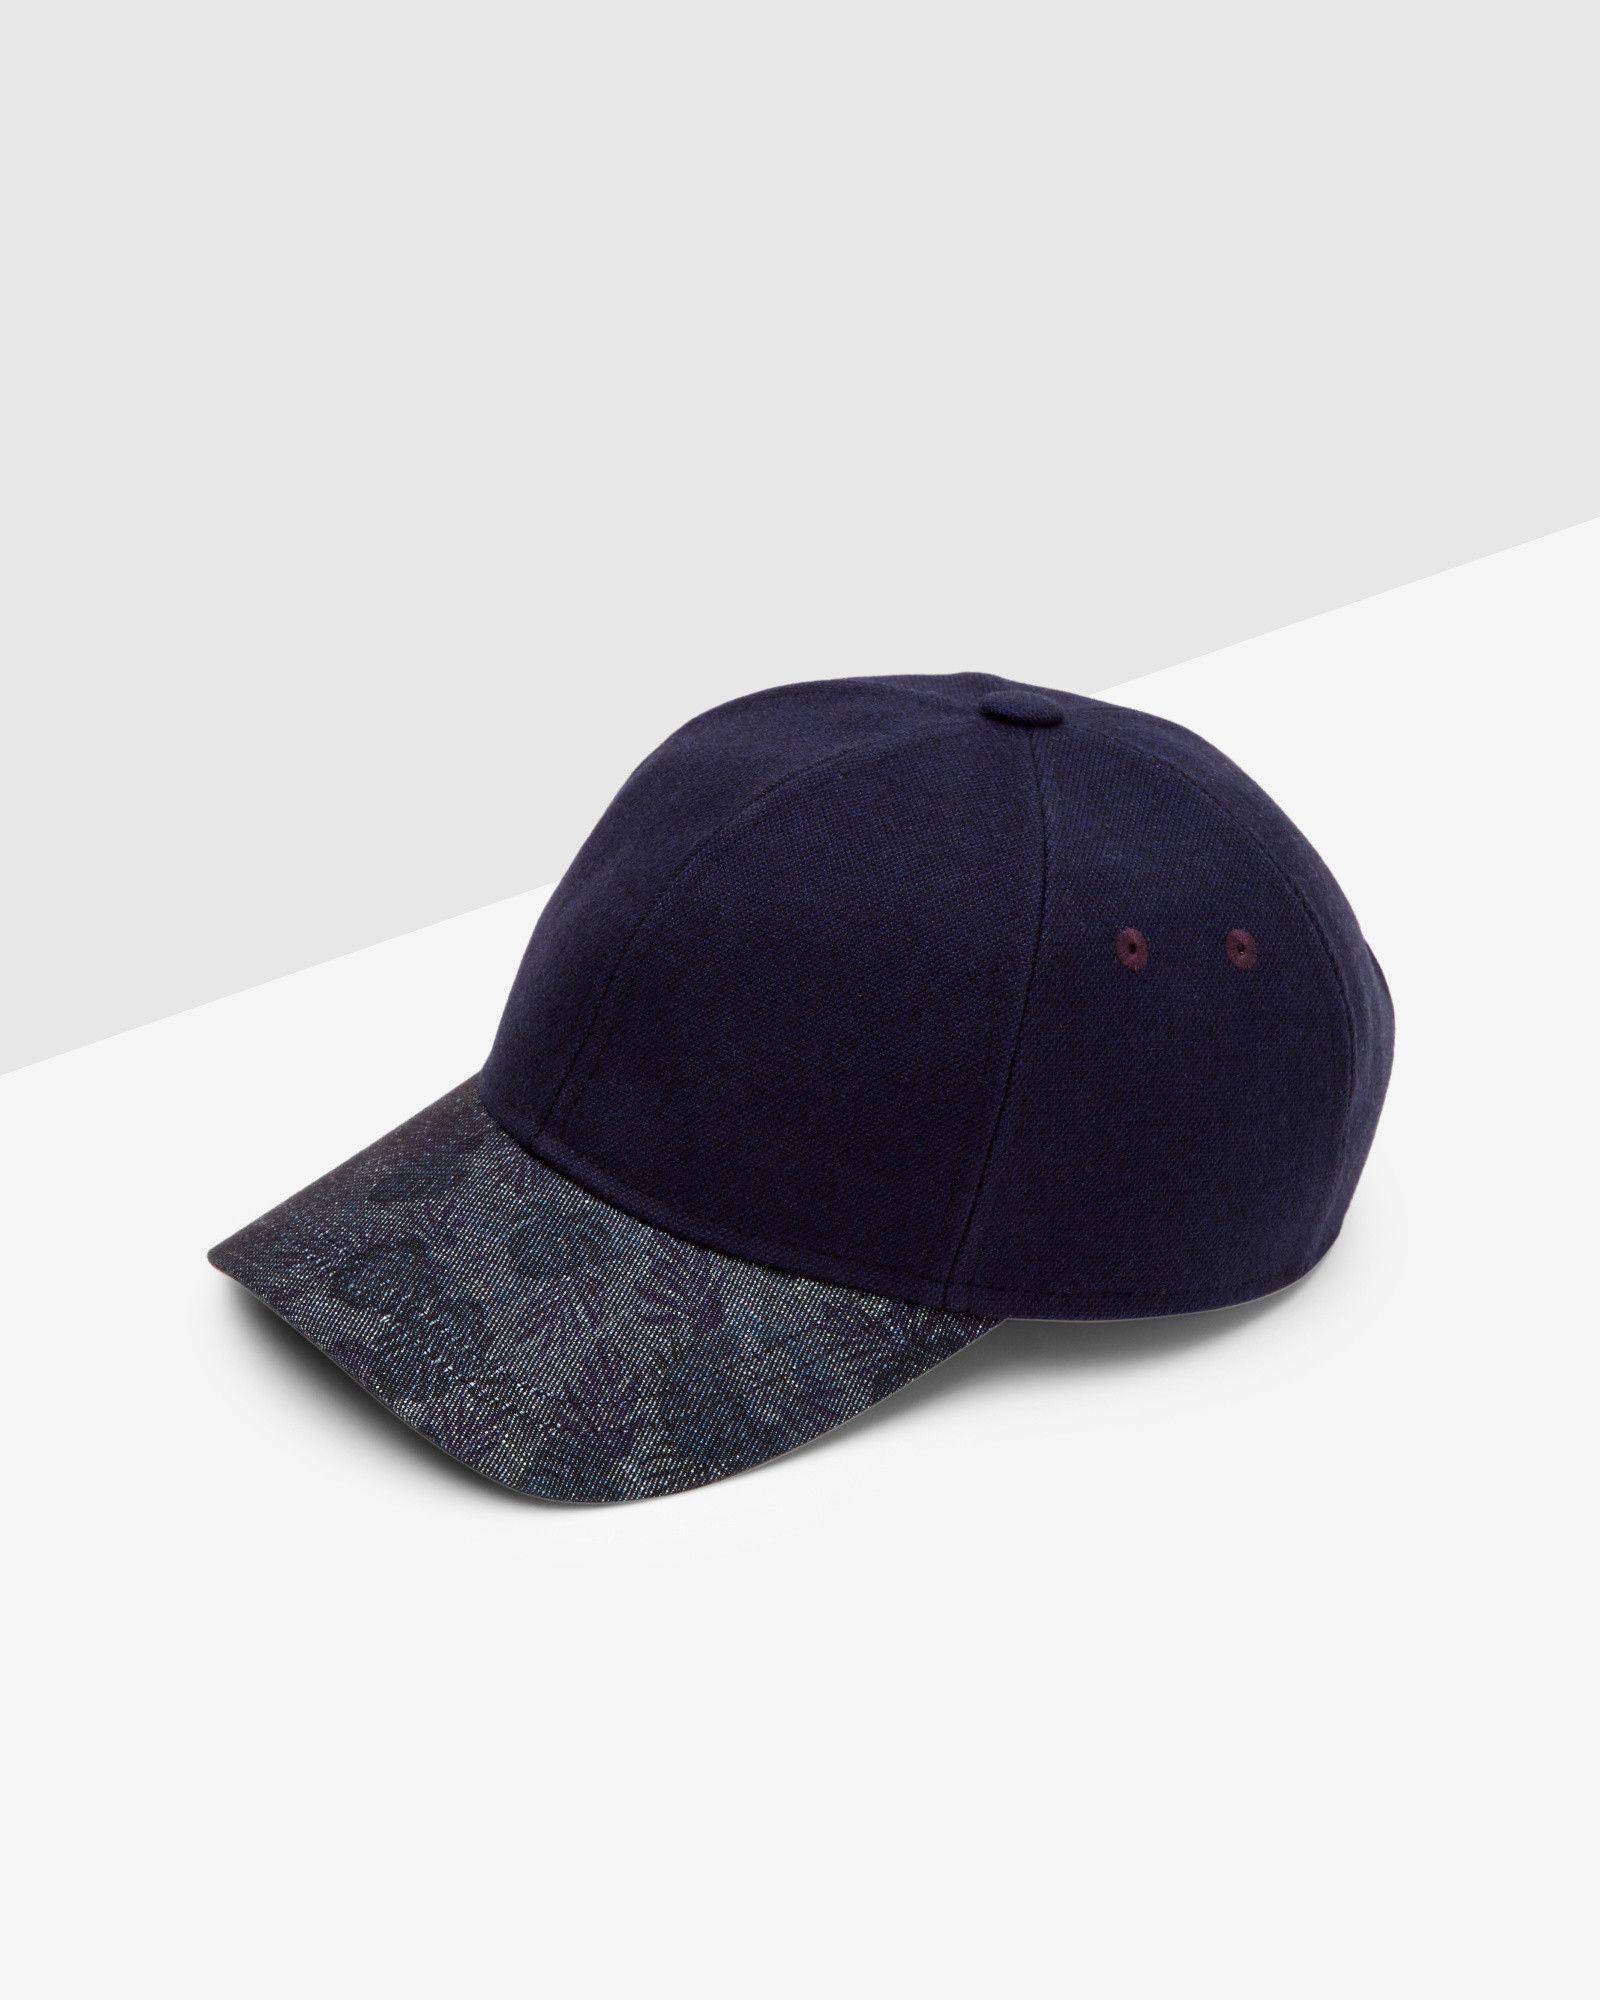 60e43f24508 Textured floral baseball cap - Navy